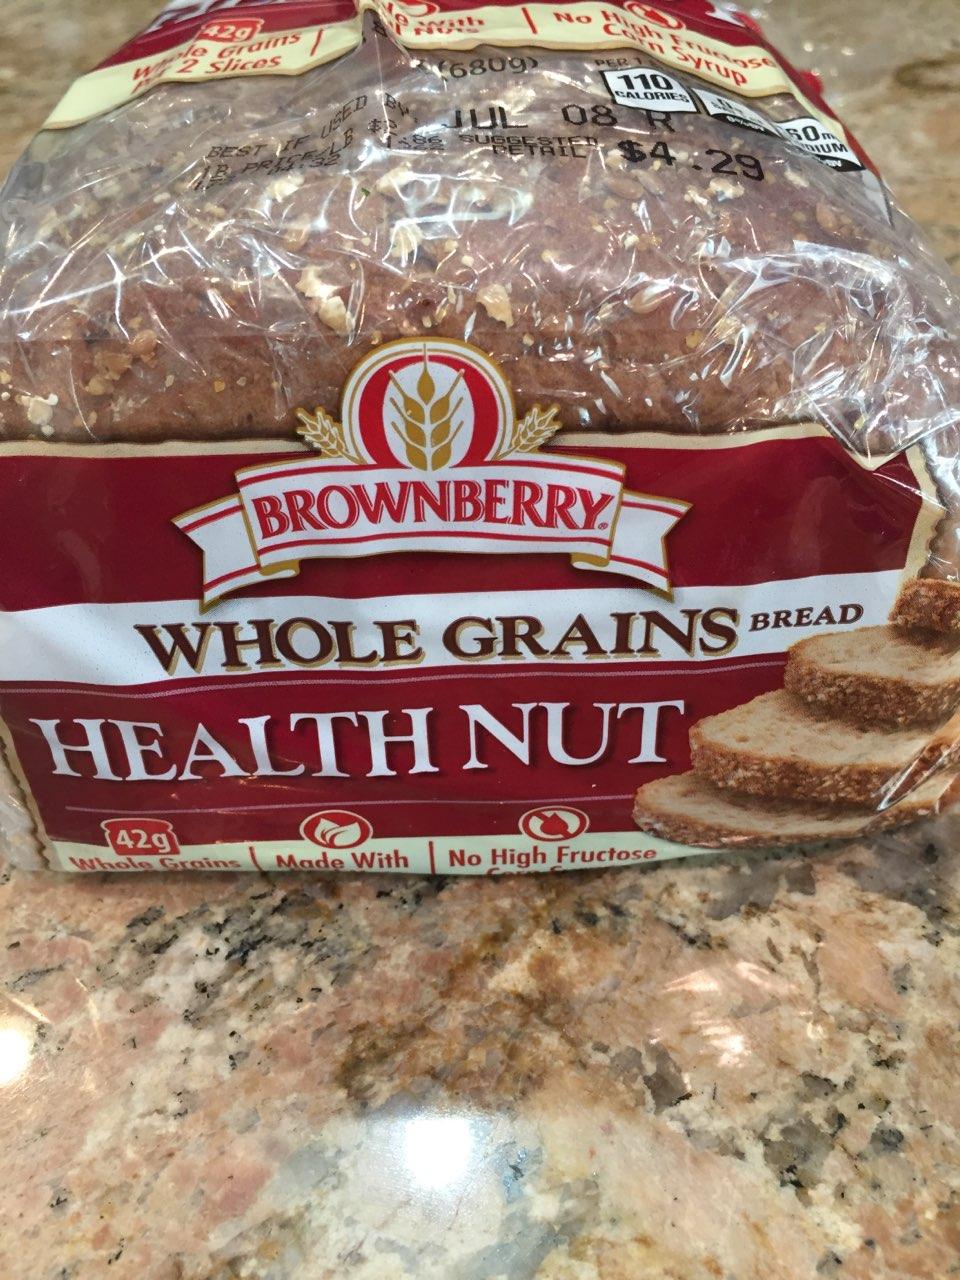 Arnold Whole Grains Health Nut Bread Calories Nutrition